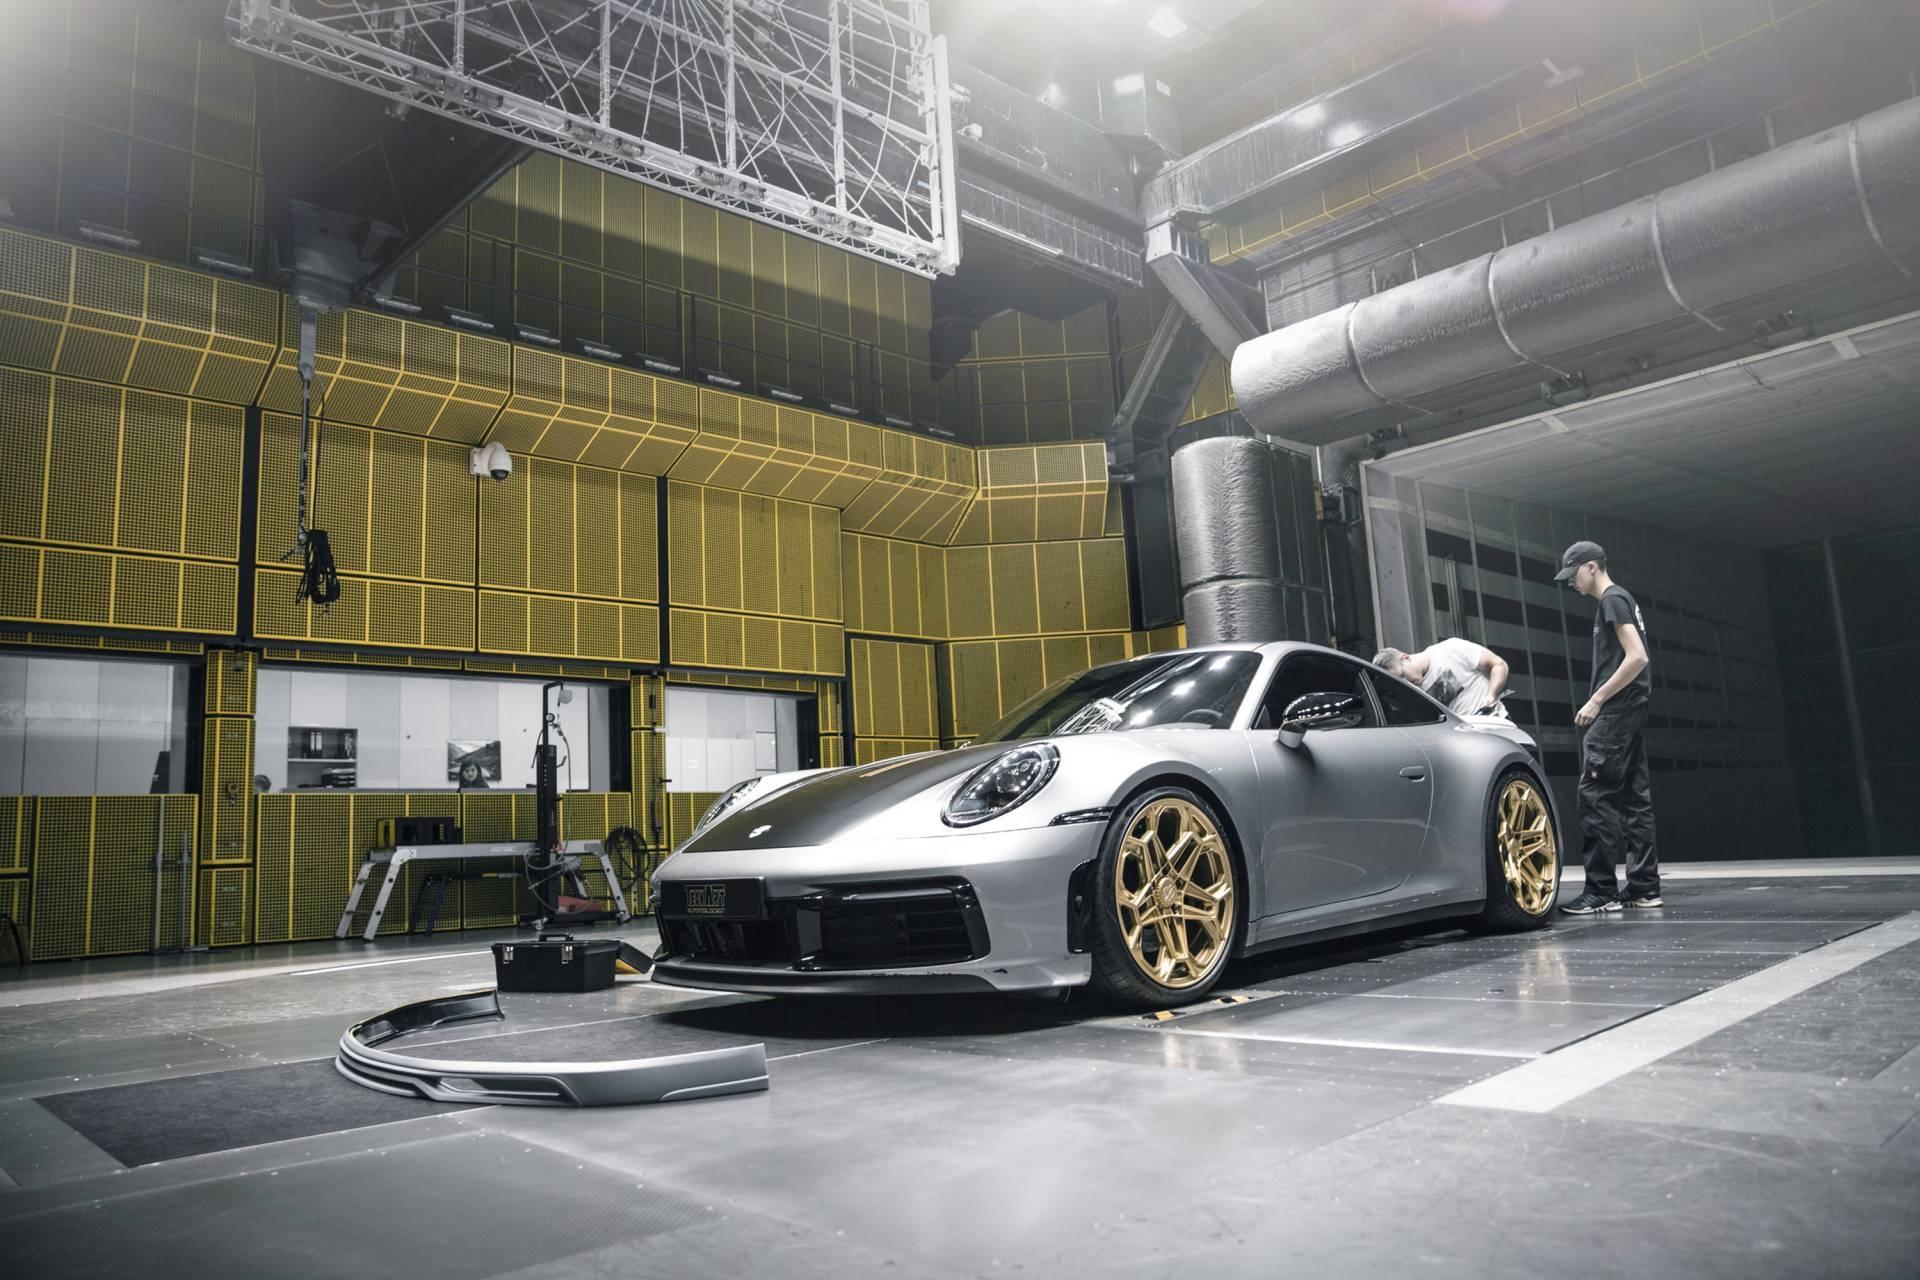 Chi tiet Porsche 911 2020 lot xac man nhan voi goi do thu cong hinh anh 33